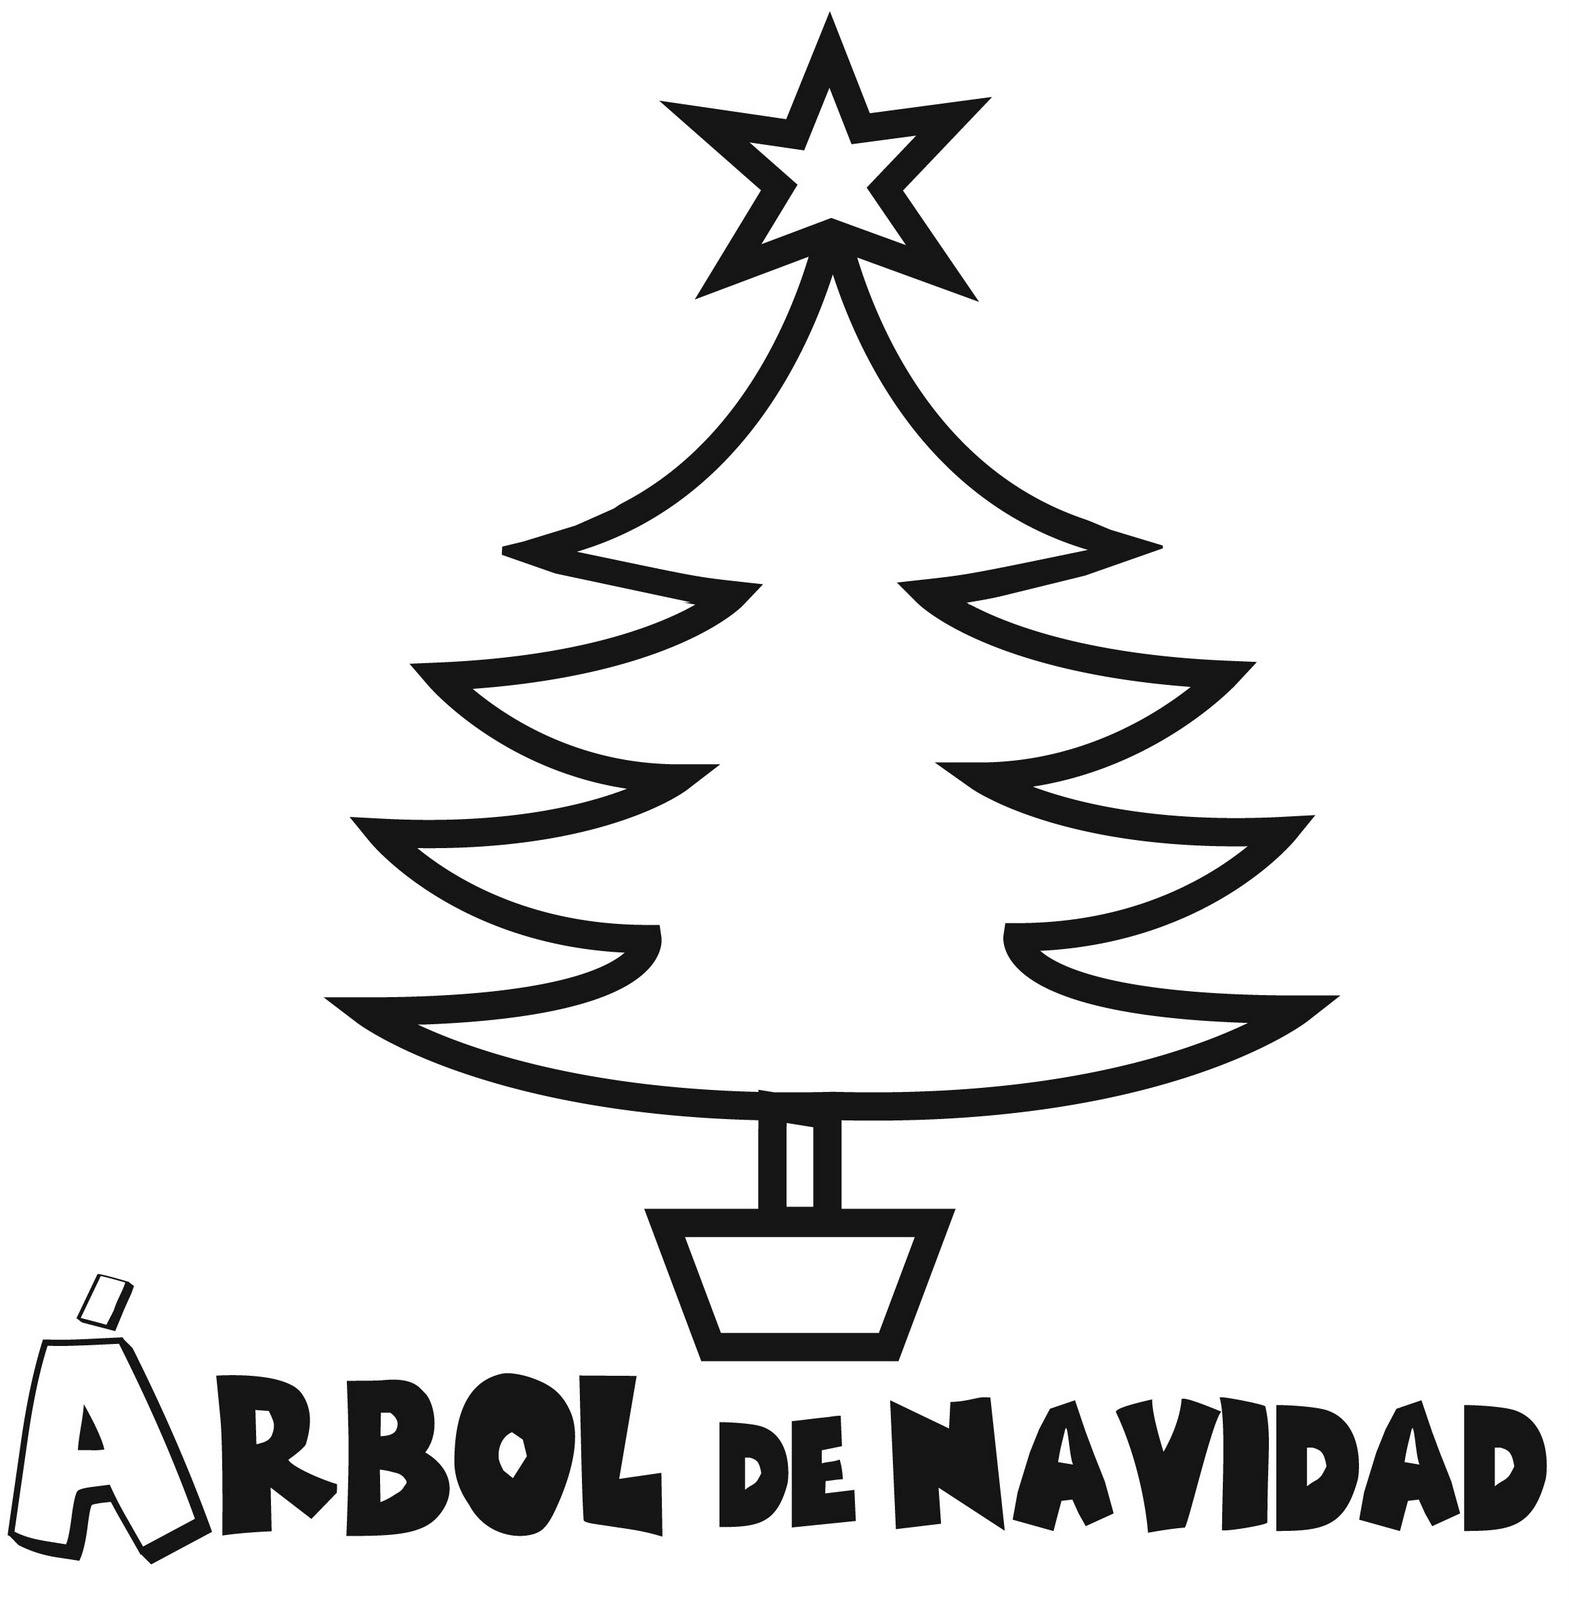 Cultura infantil rbol de navidad para colorear for Dibujo arbol navidad